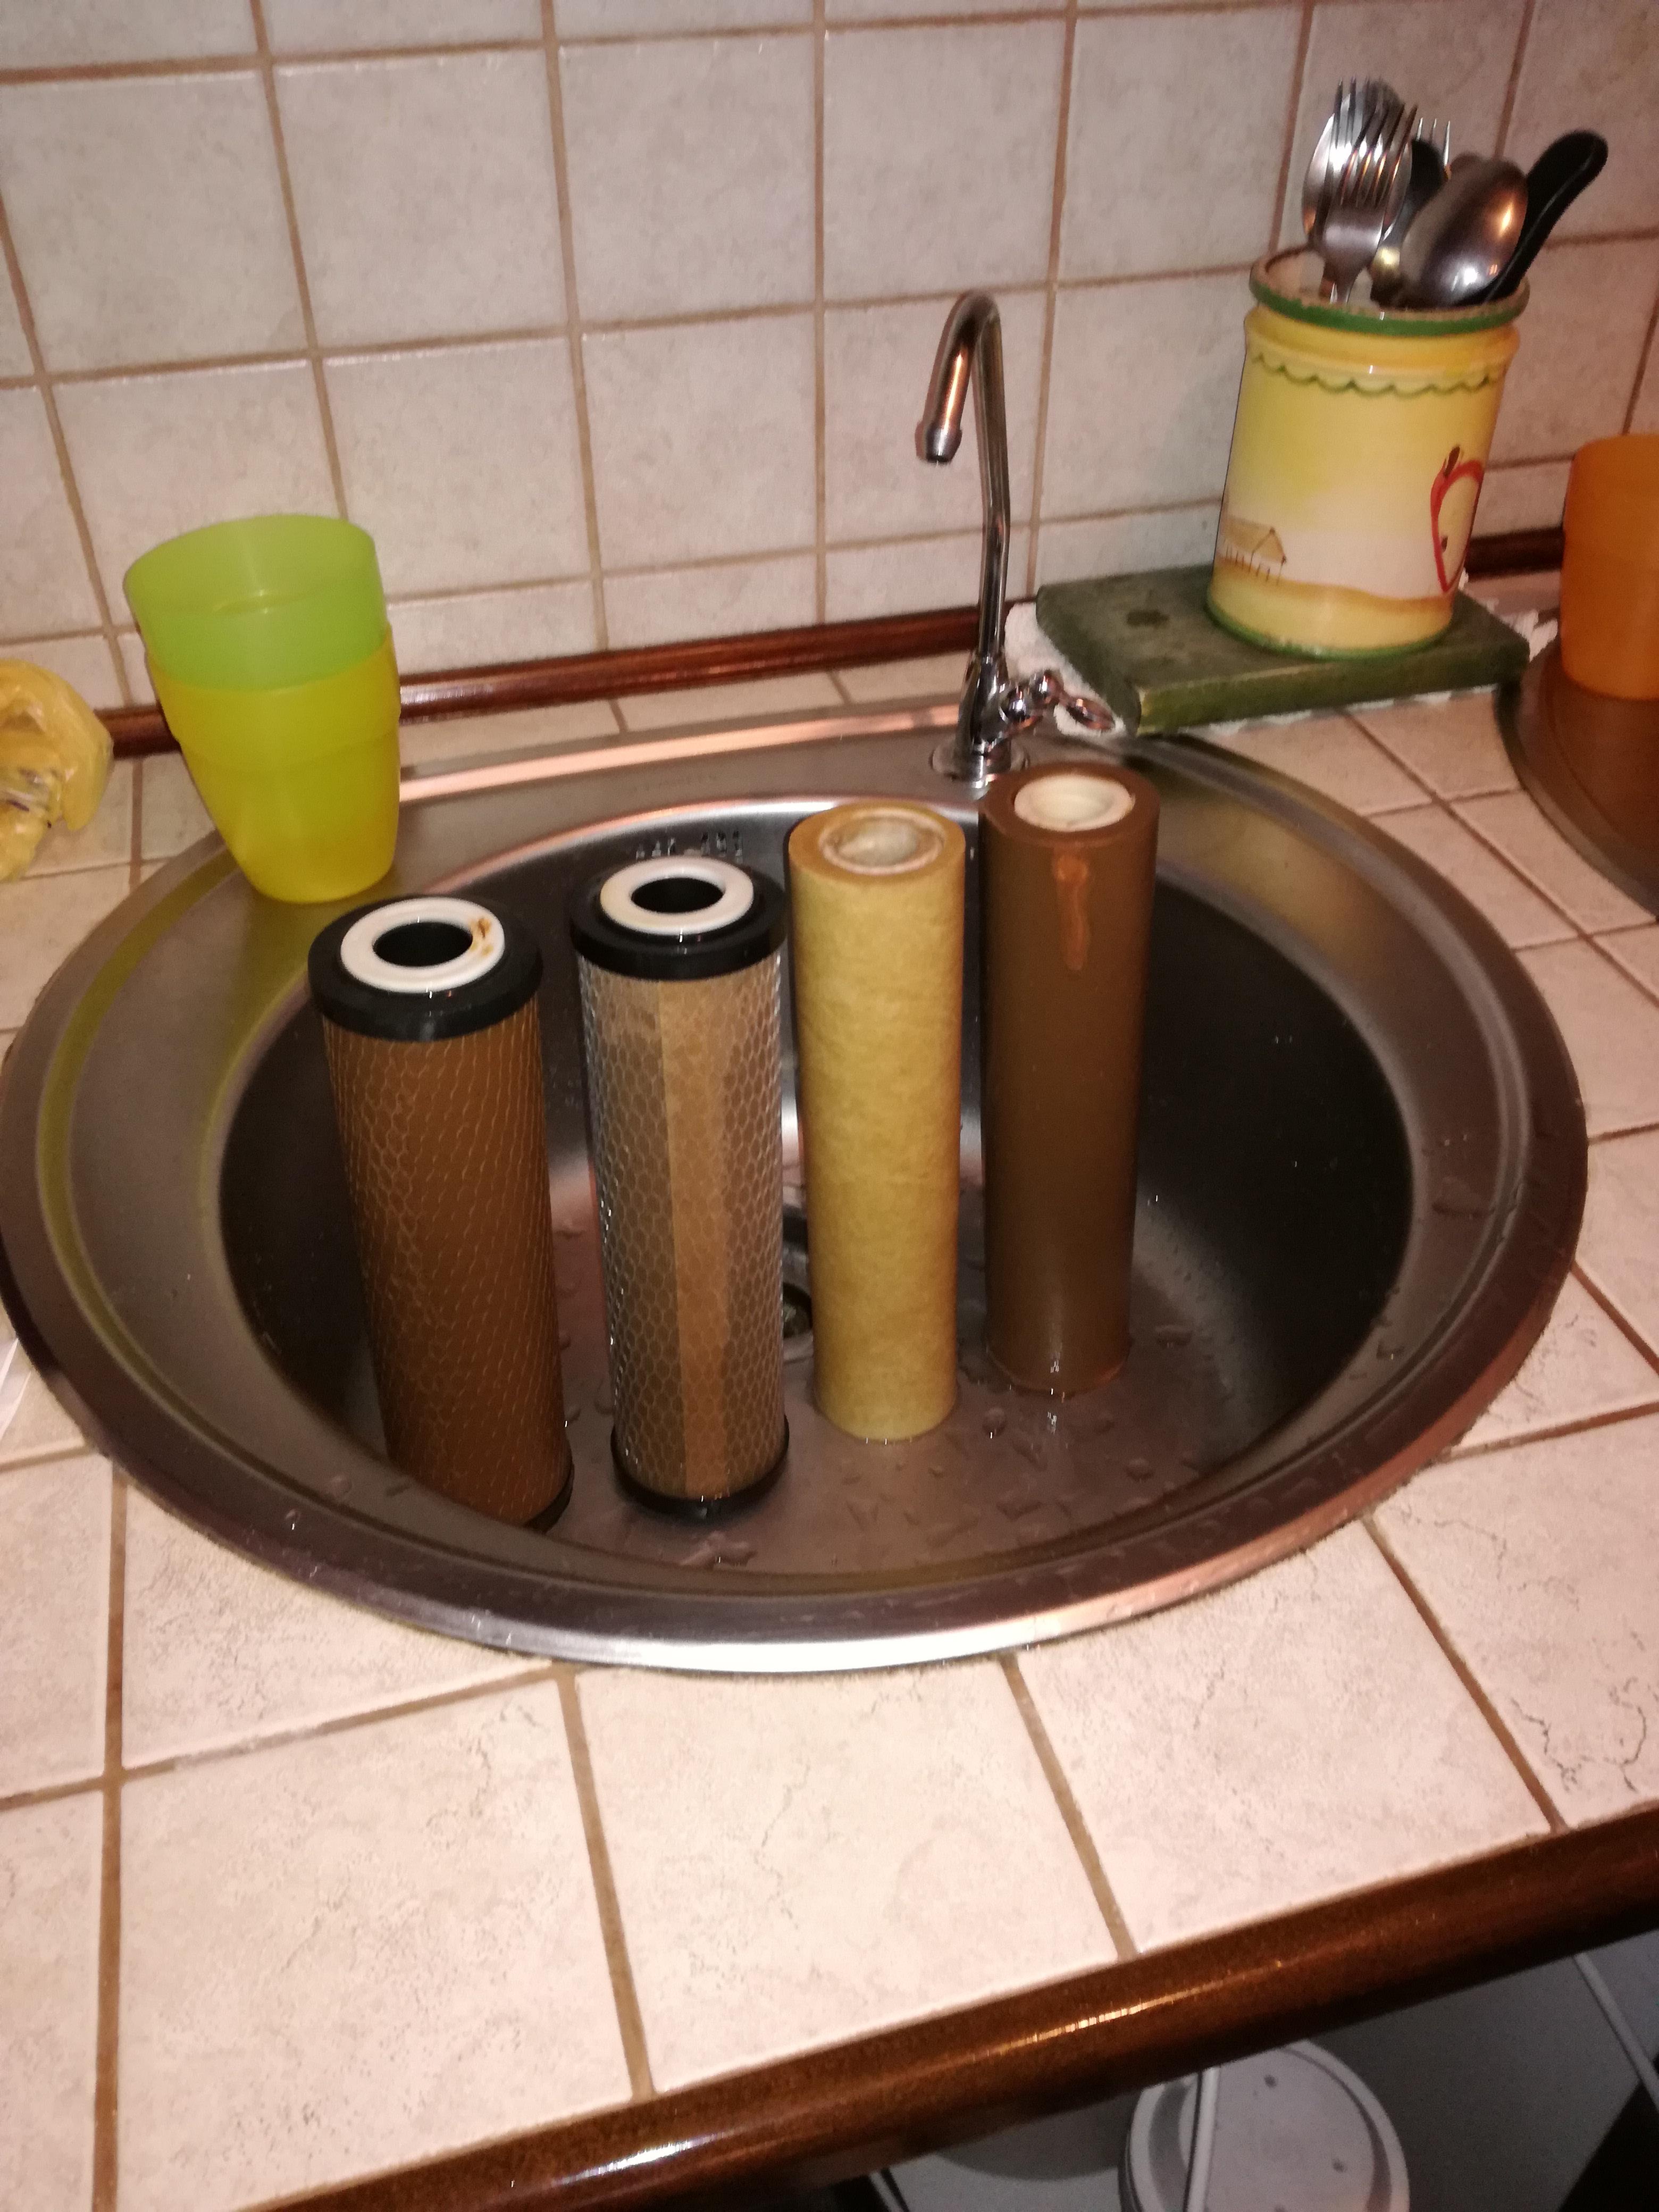 Zamena filtera 2 - iskorišćeni filteri